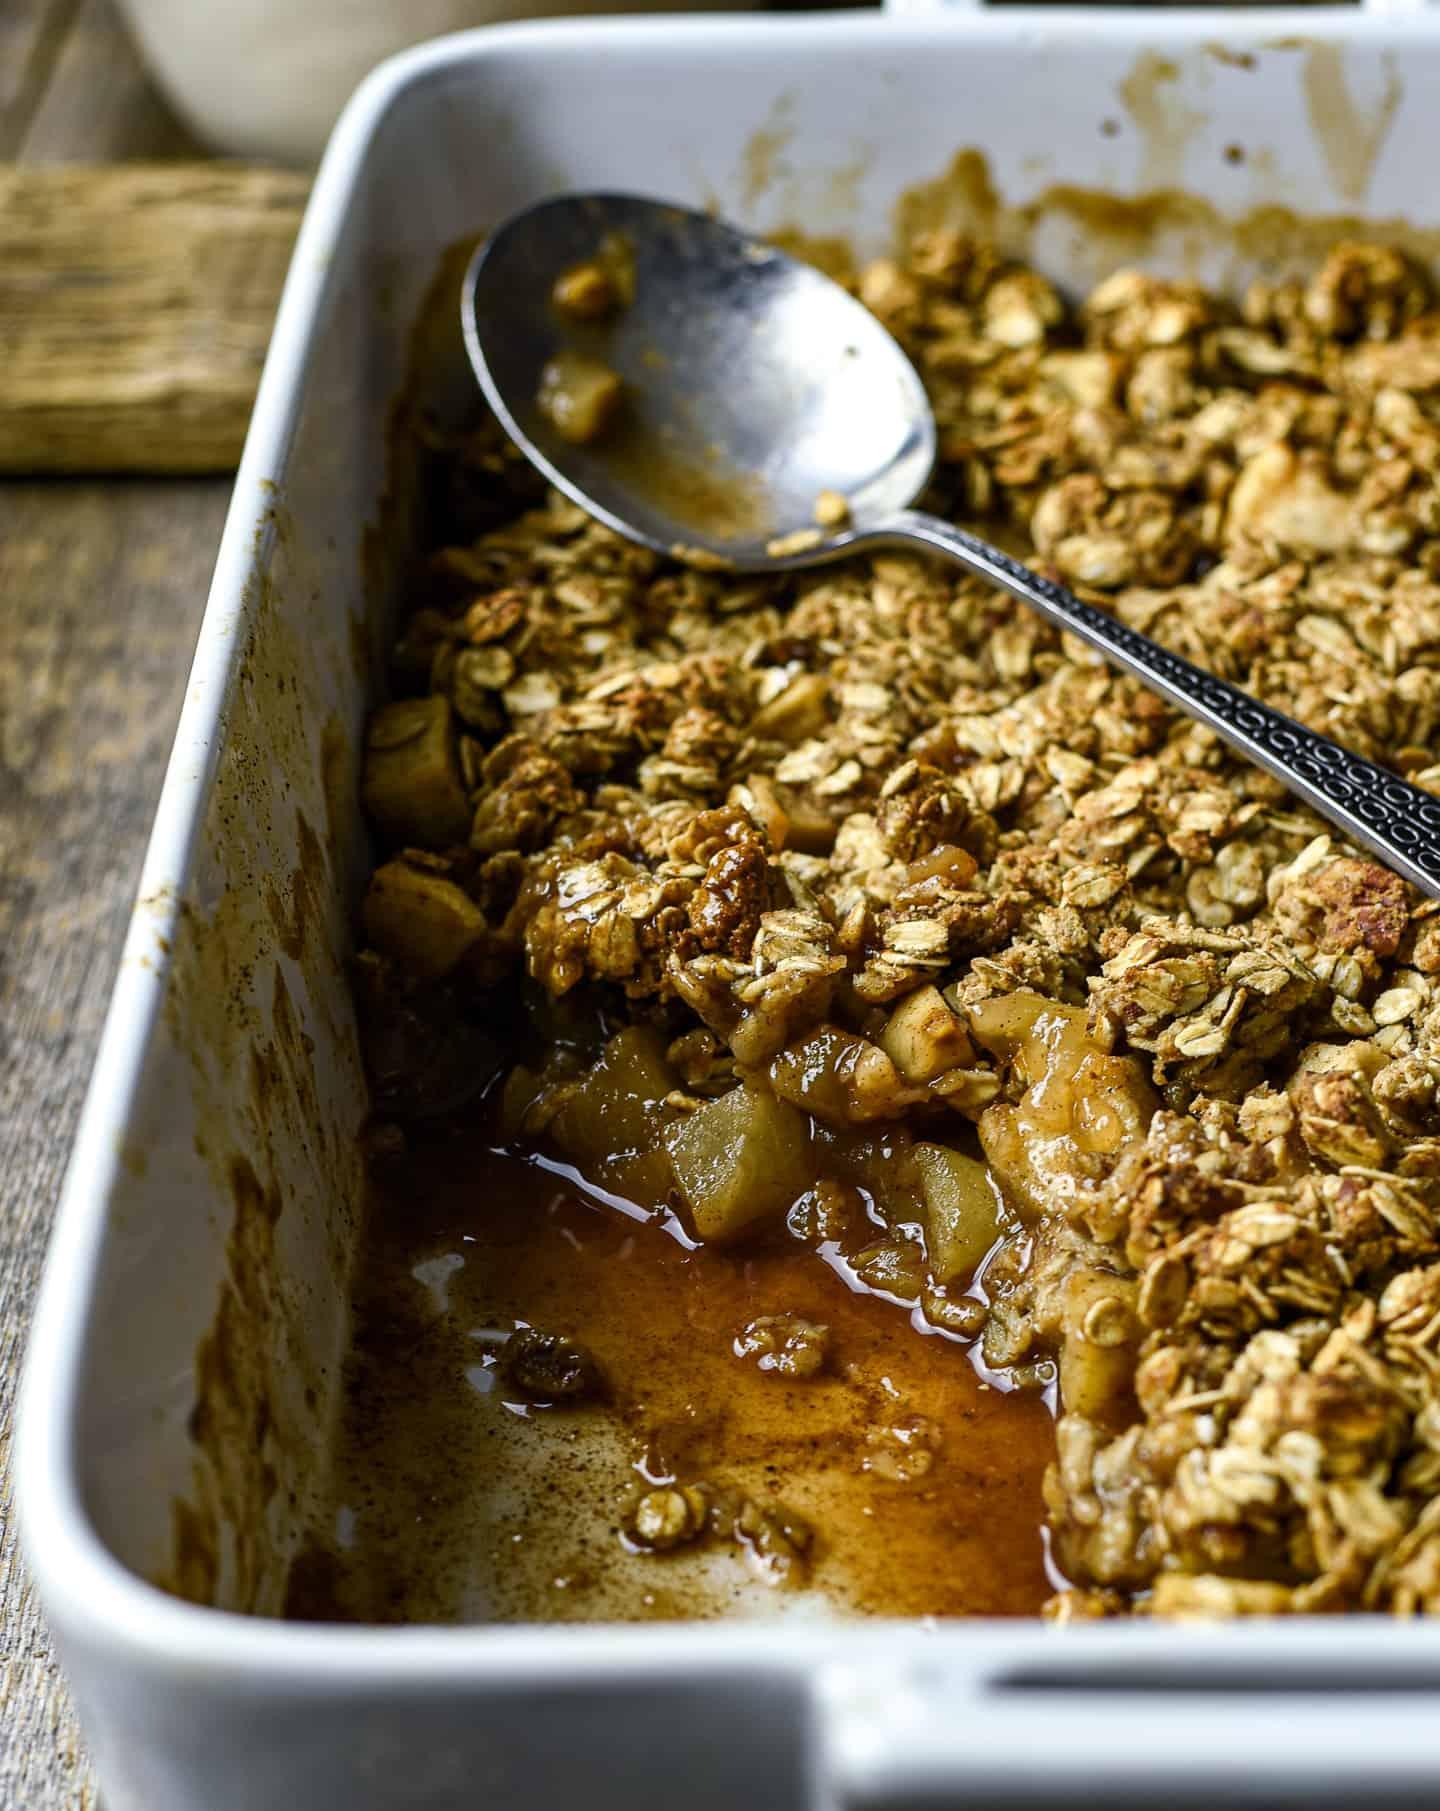 vegan apple crisp in baking dish with spoon.